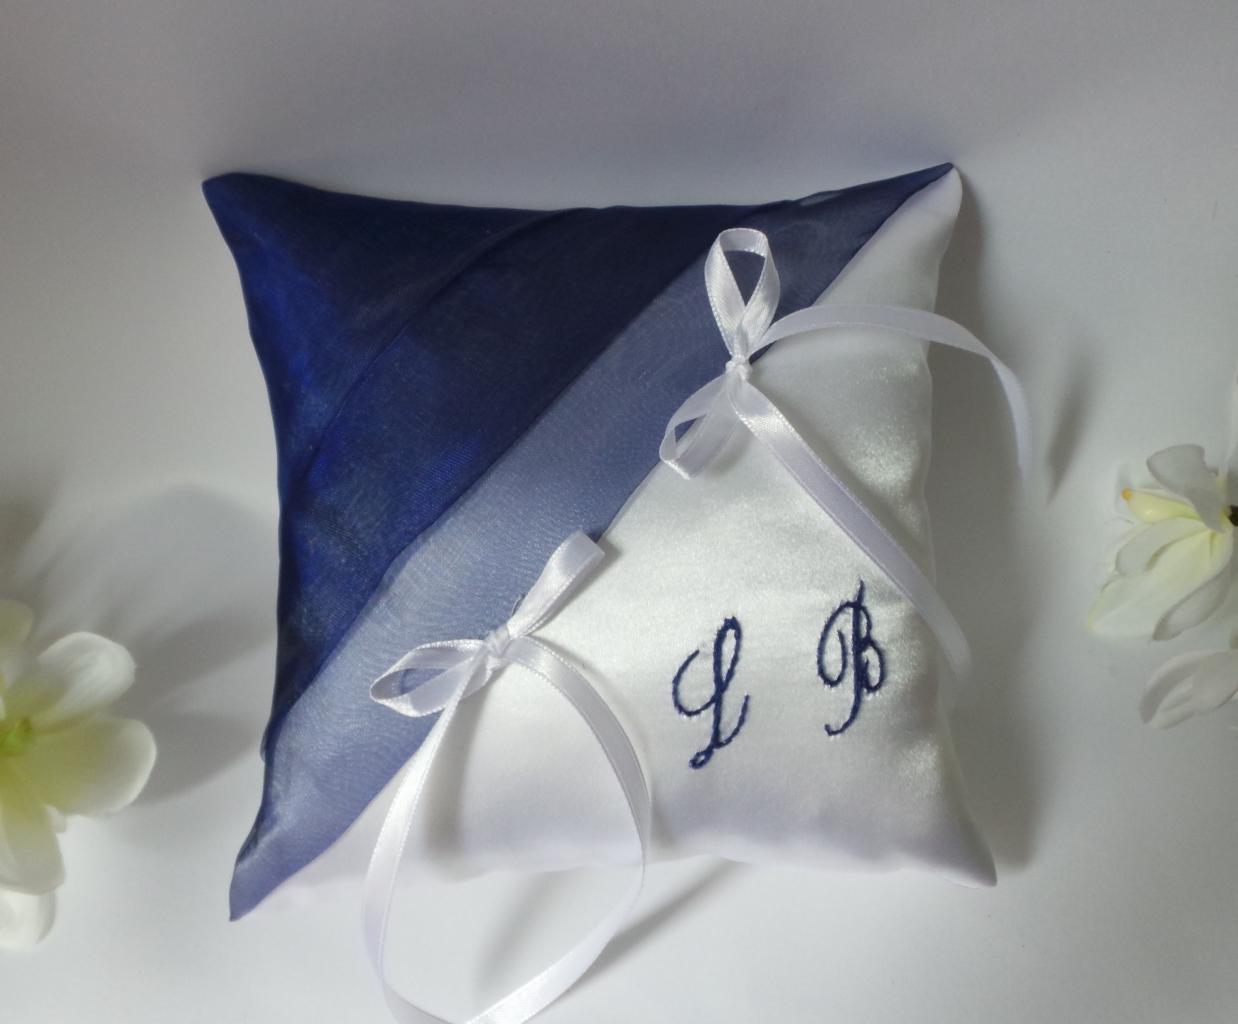 coussin alliances bleu marine blanc (75)